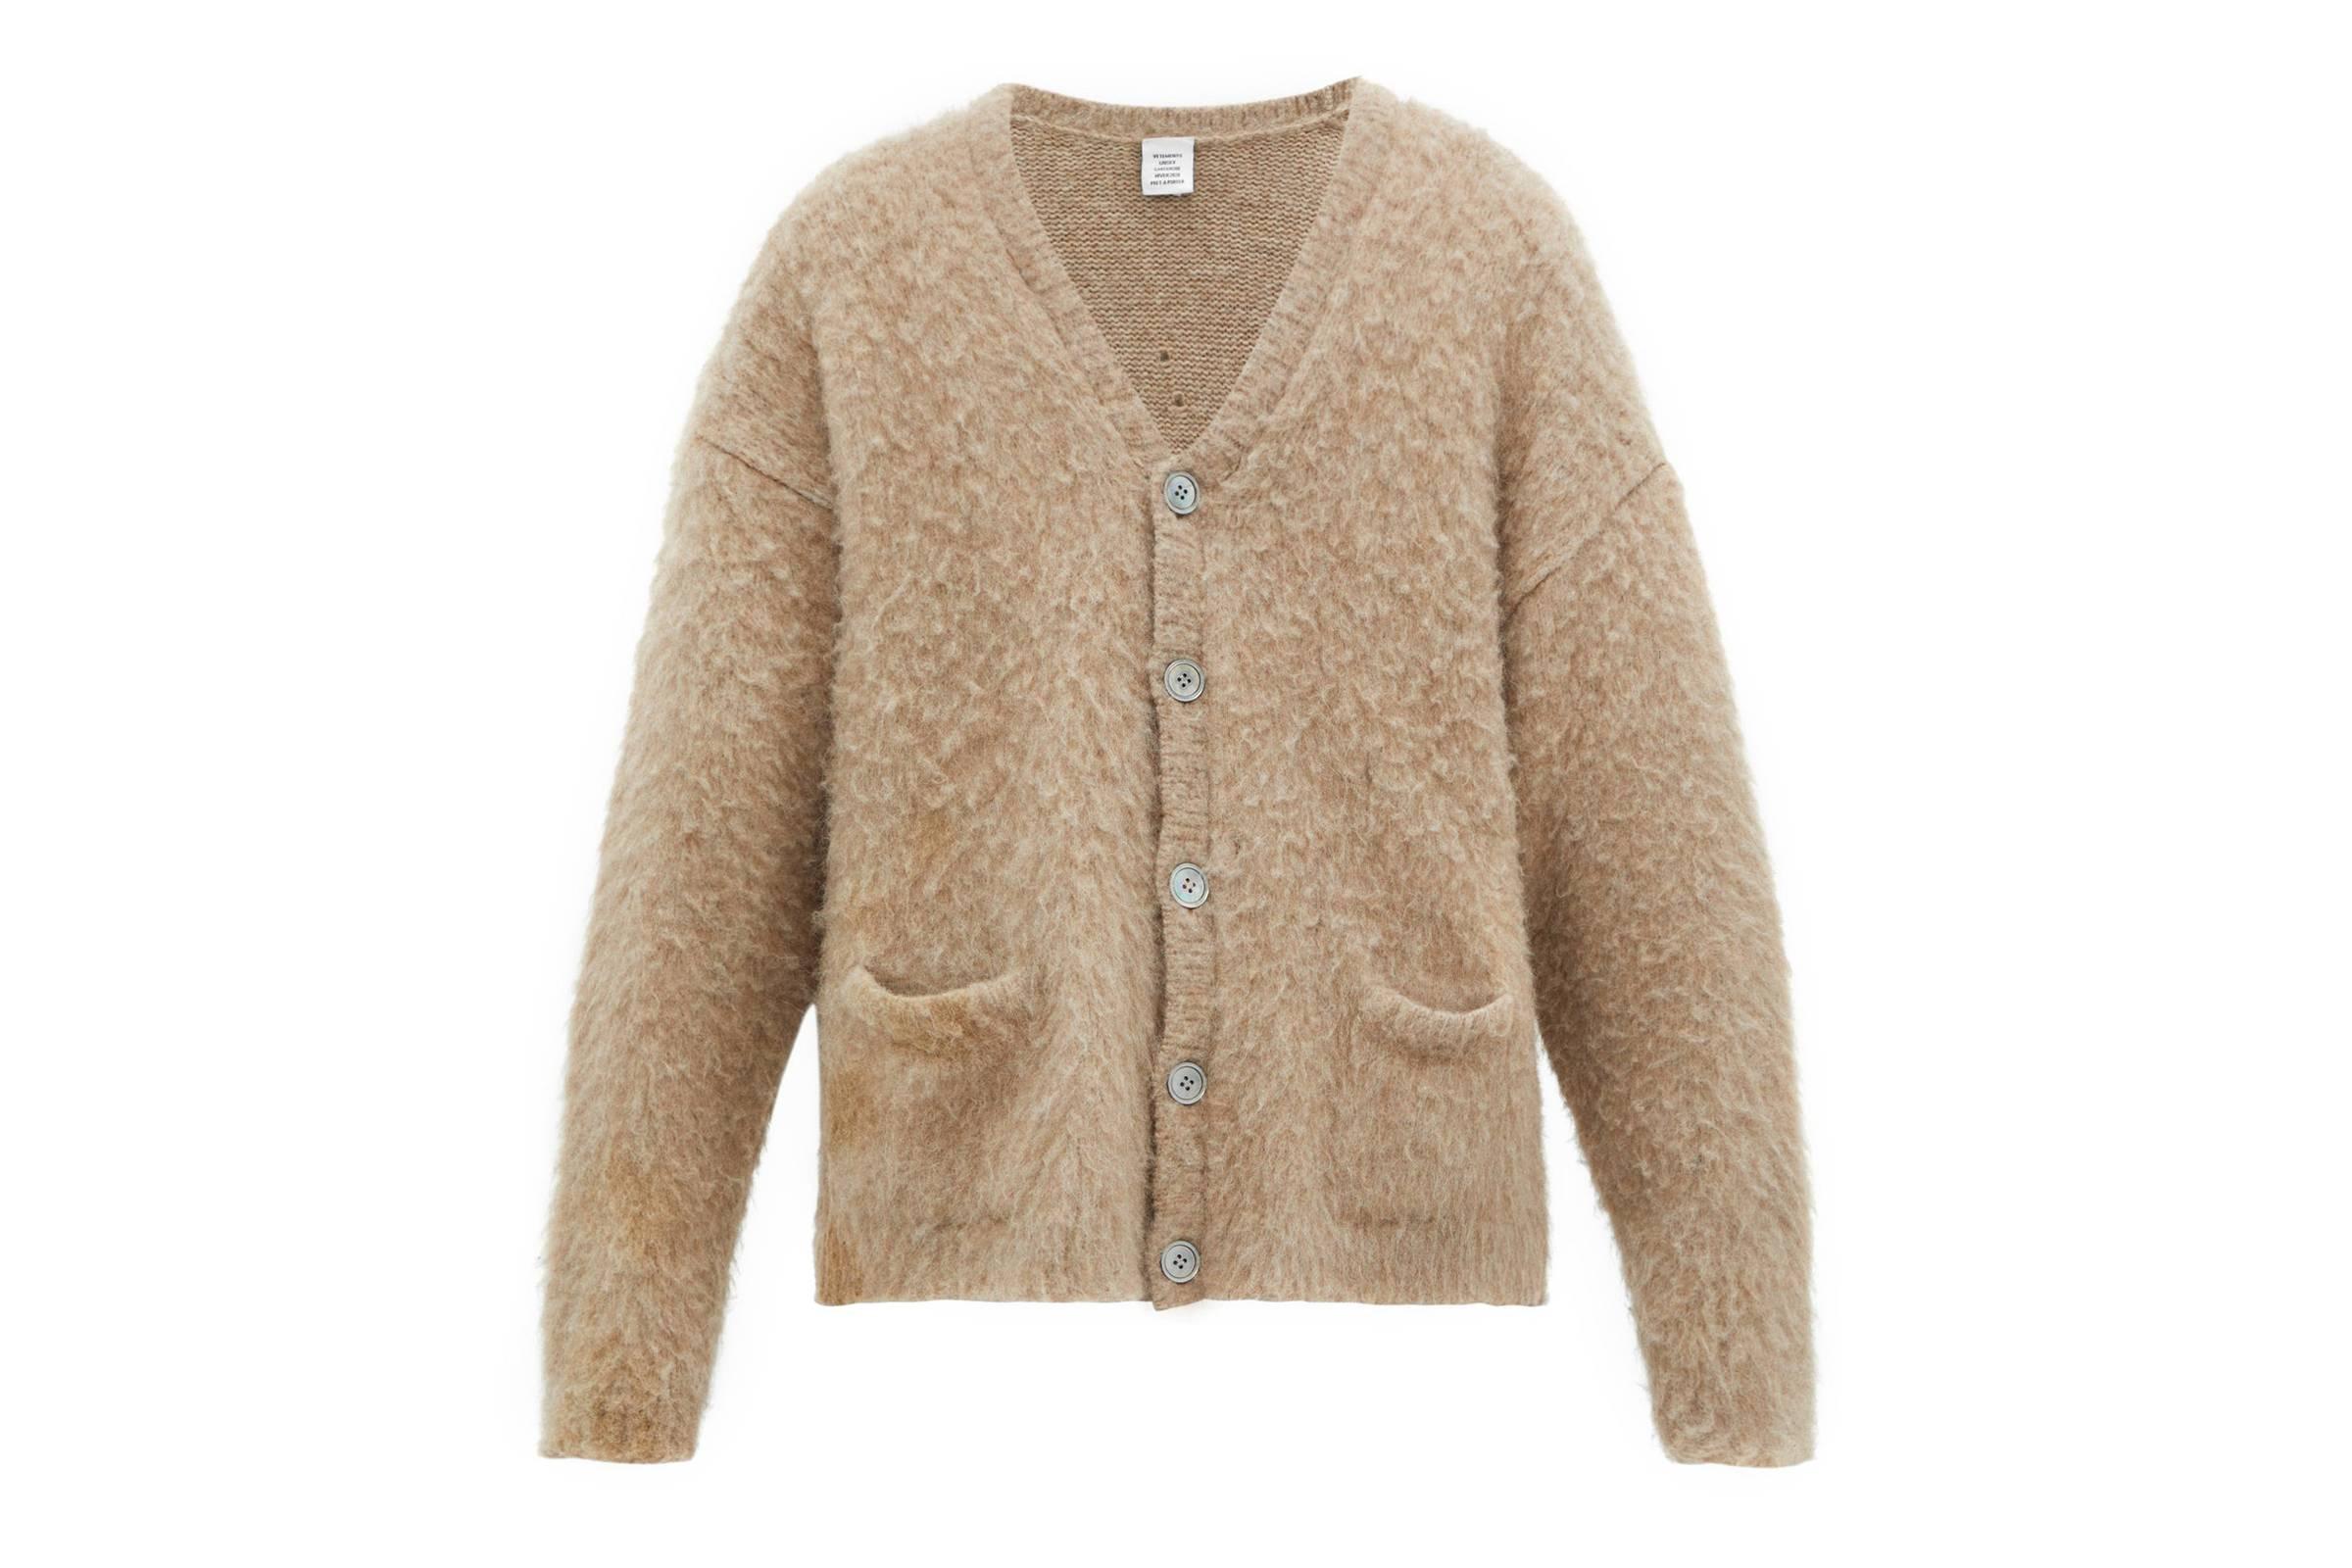 Vetements Fall/Winter 2019 Five-Button Alpaca-Blend Cardigan